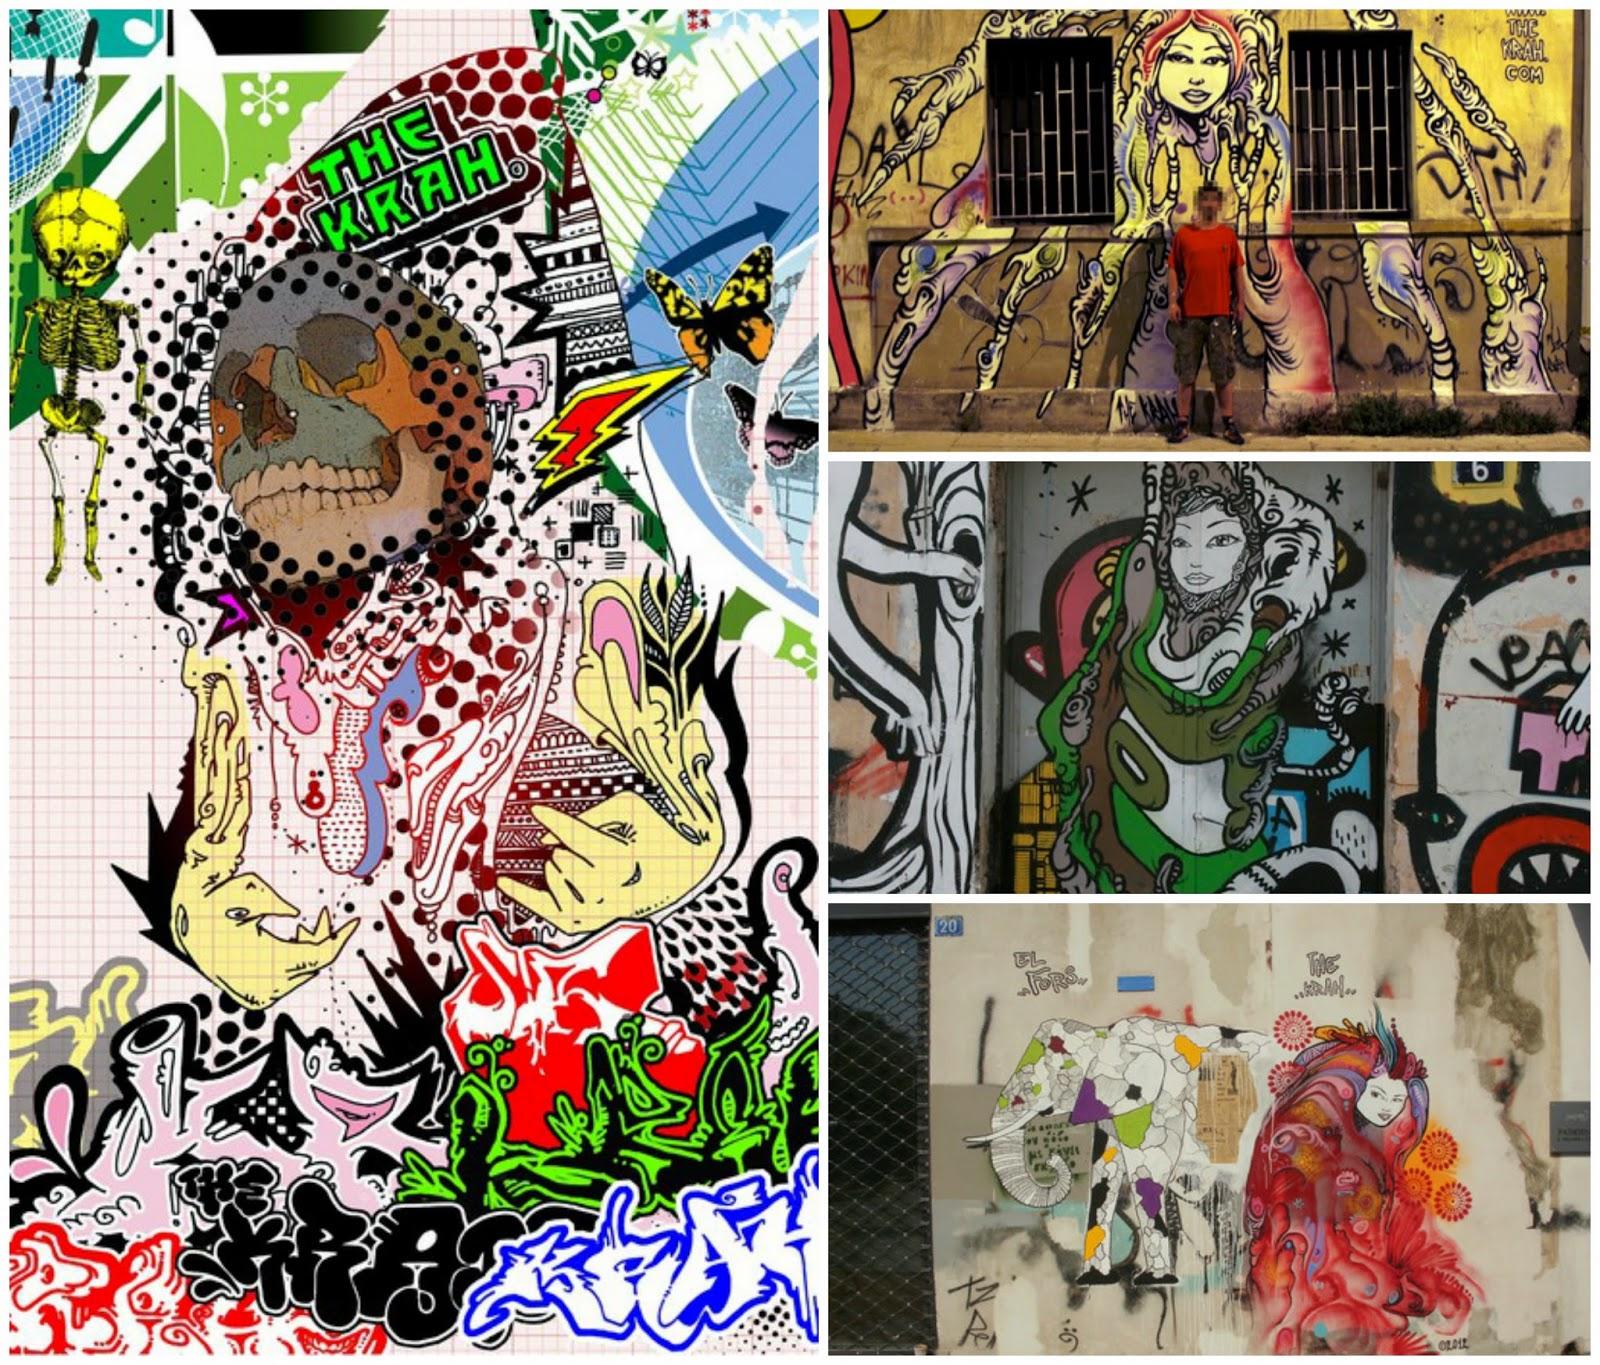 The Krah Street Artist Athens